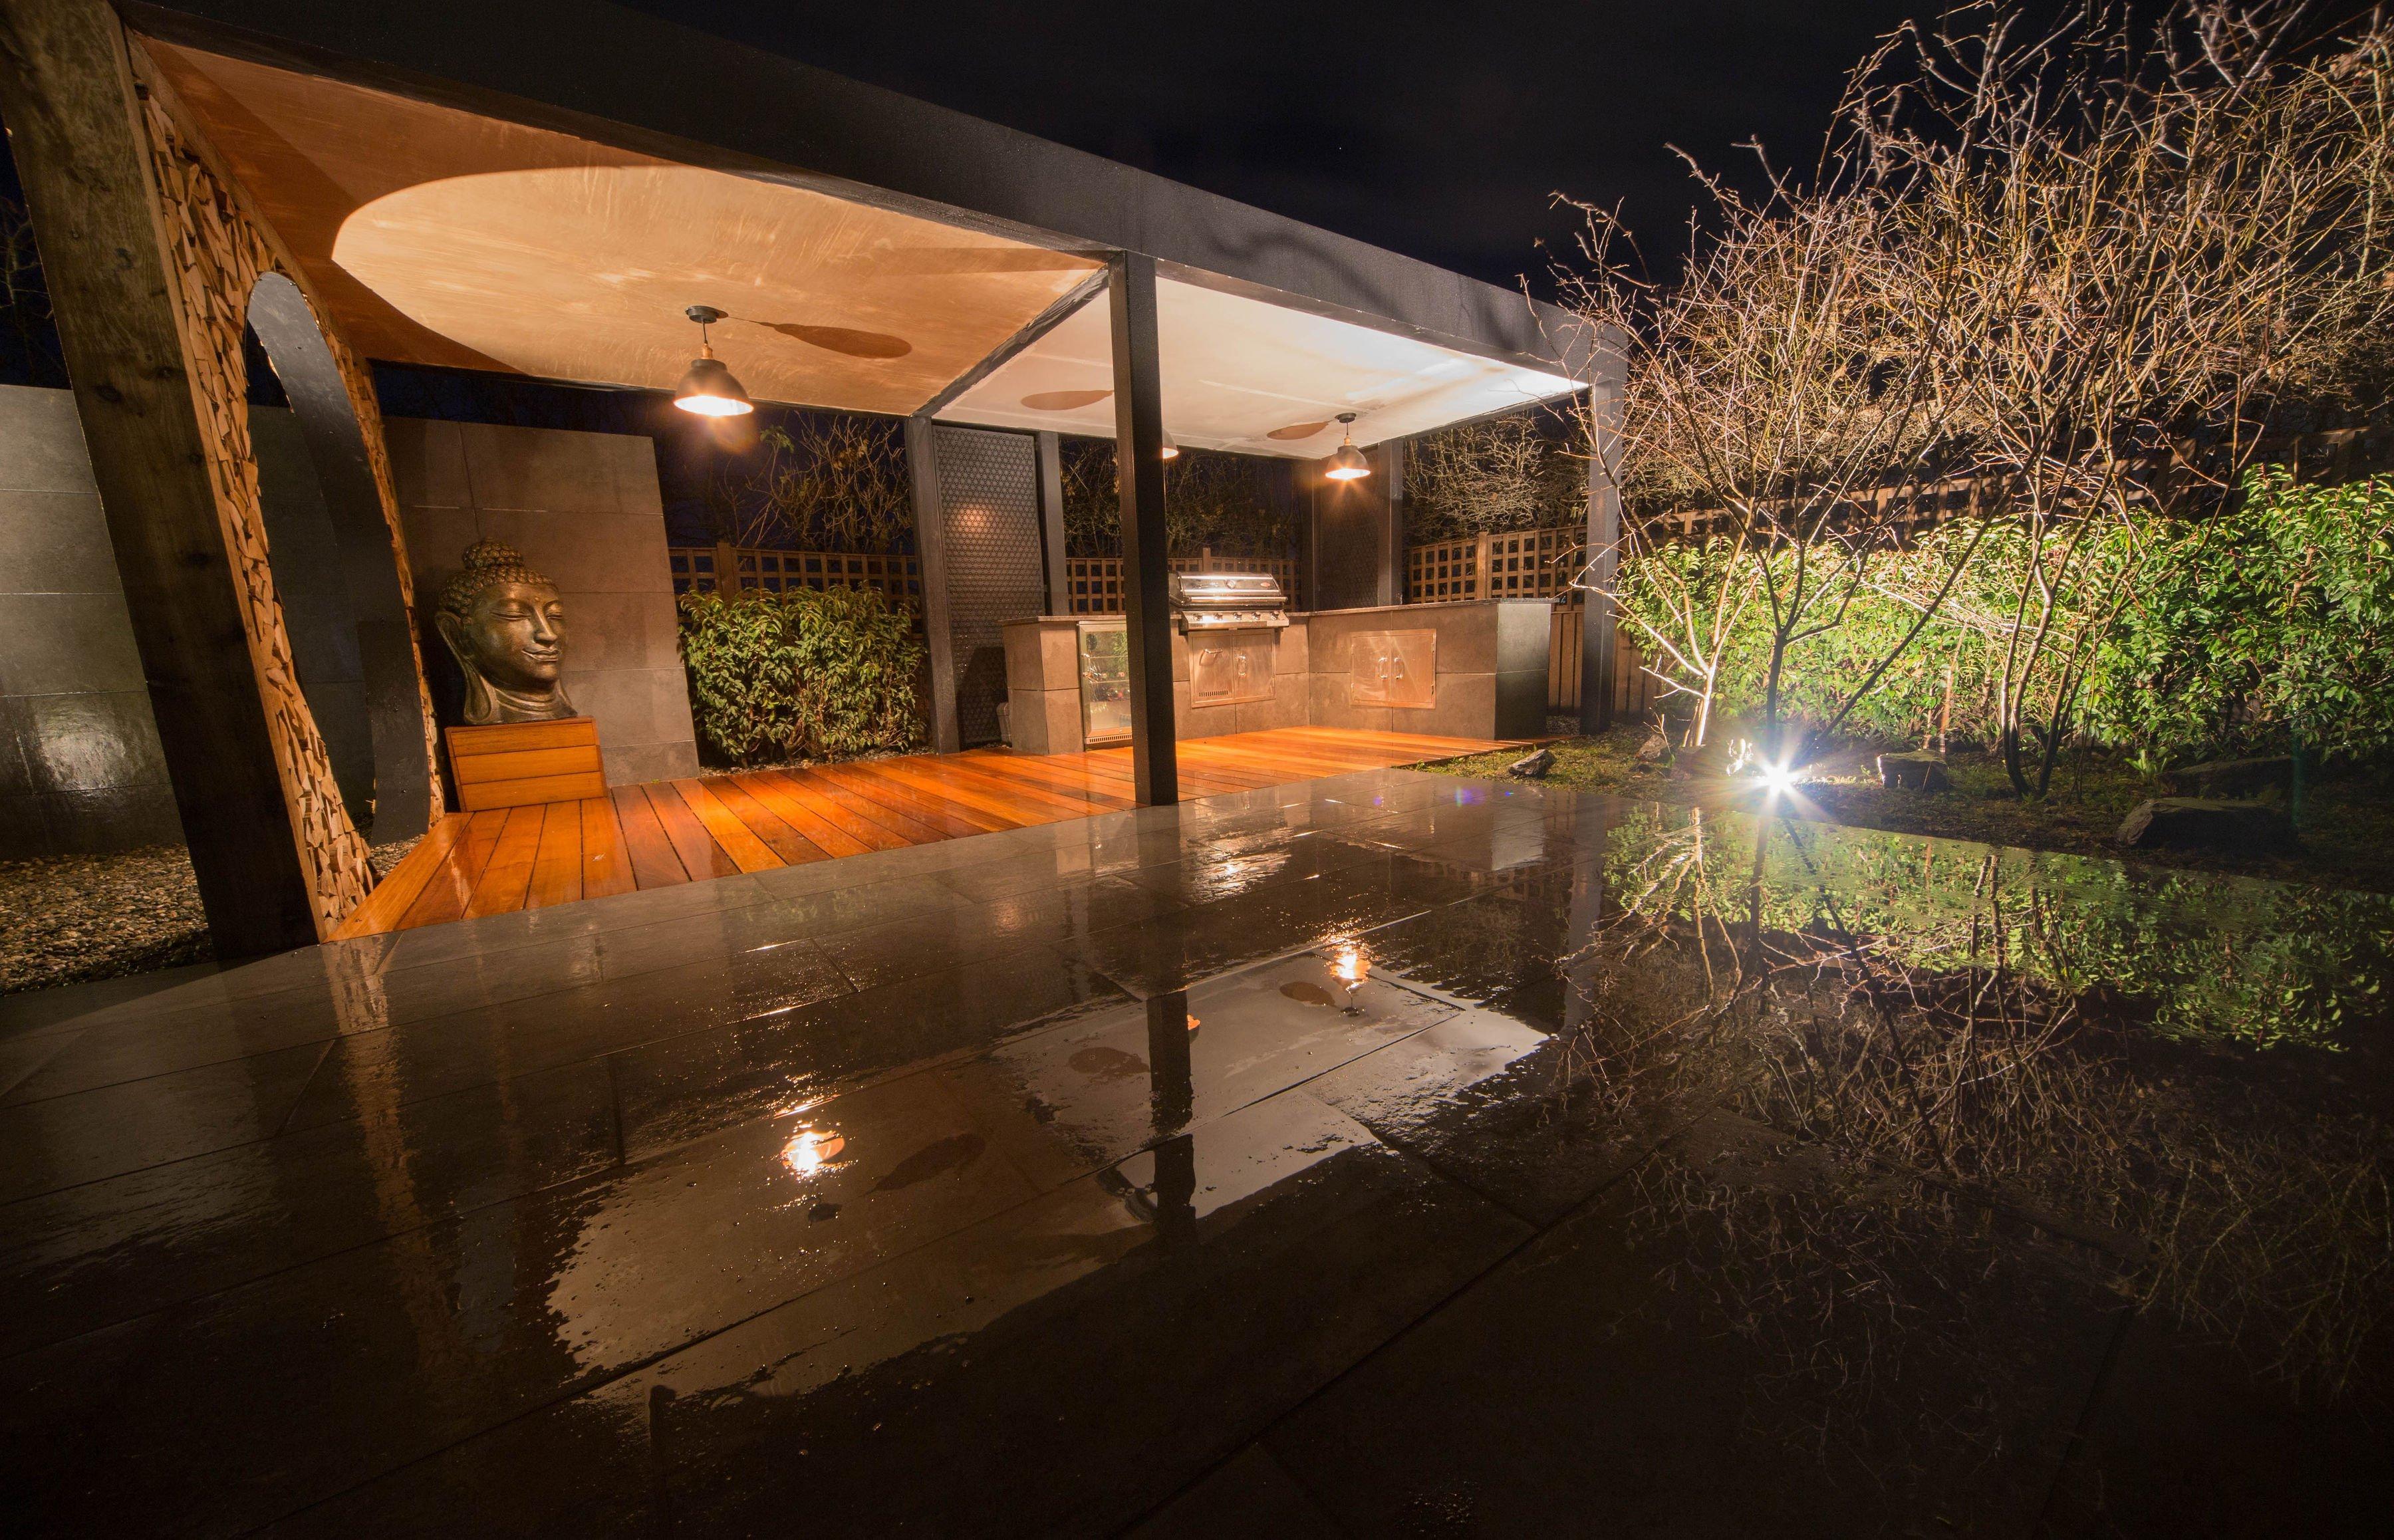 Garden Lighting in Landscape design and Warnes- McGarr & Co.